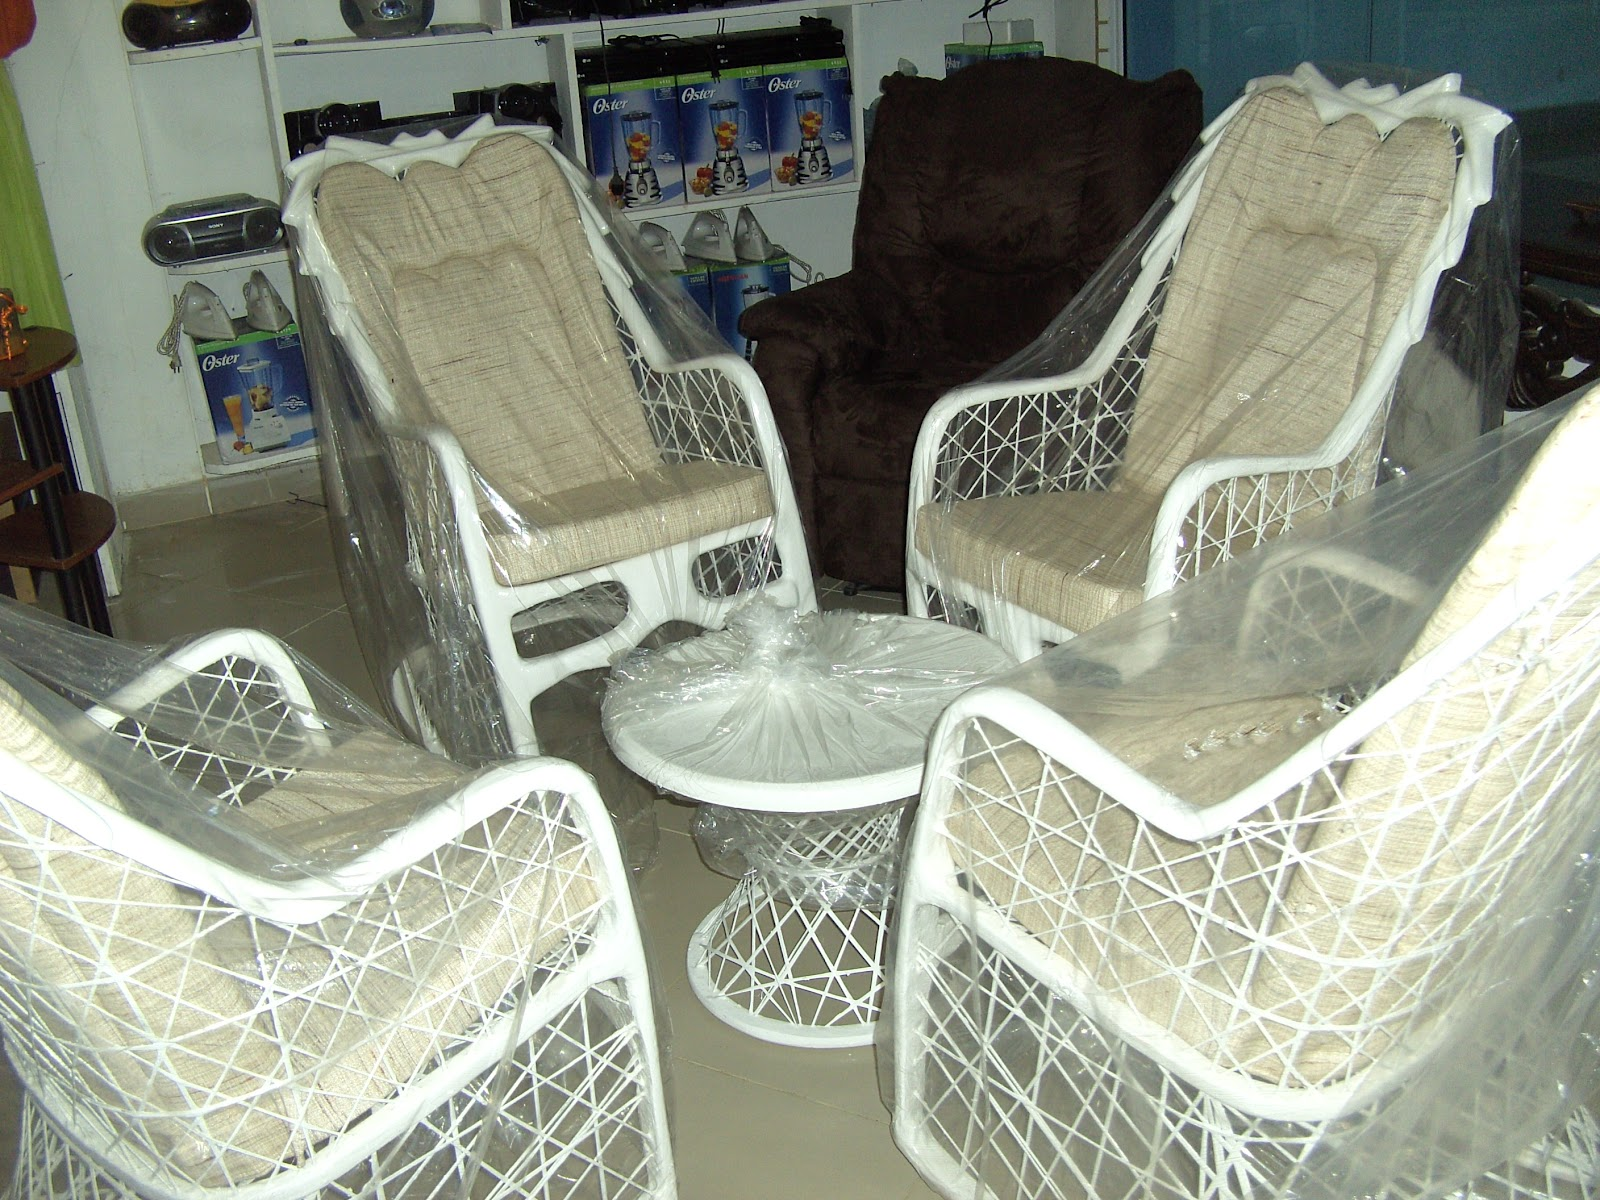 Plaza electromuebles delkis mecedoras en fibra de vidrio for Muebles de fibra de vidrio